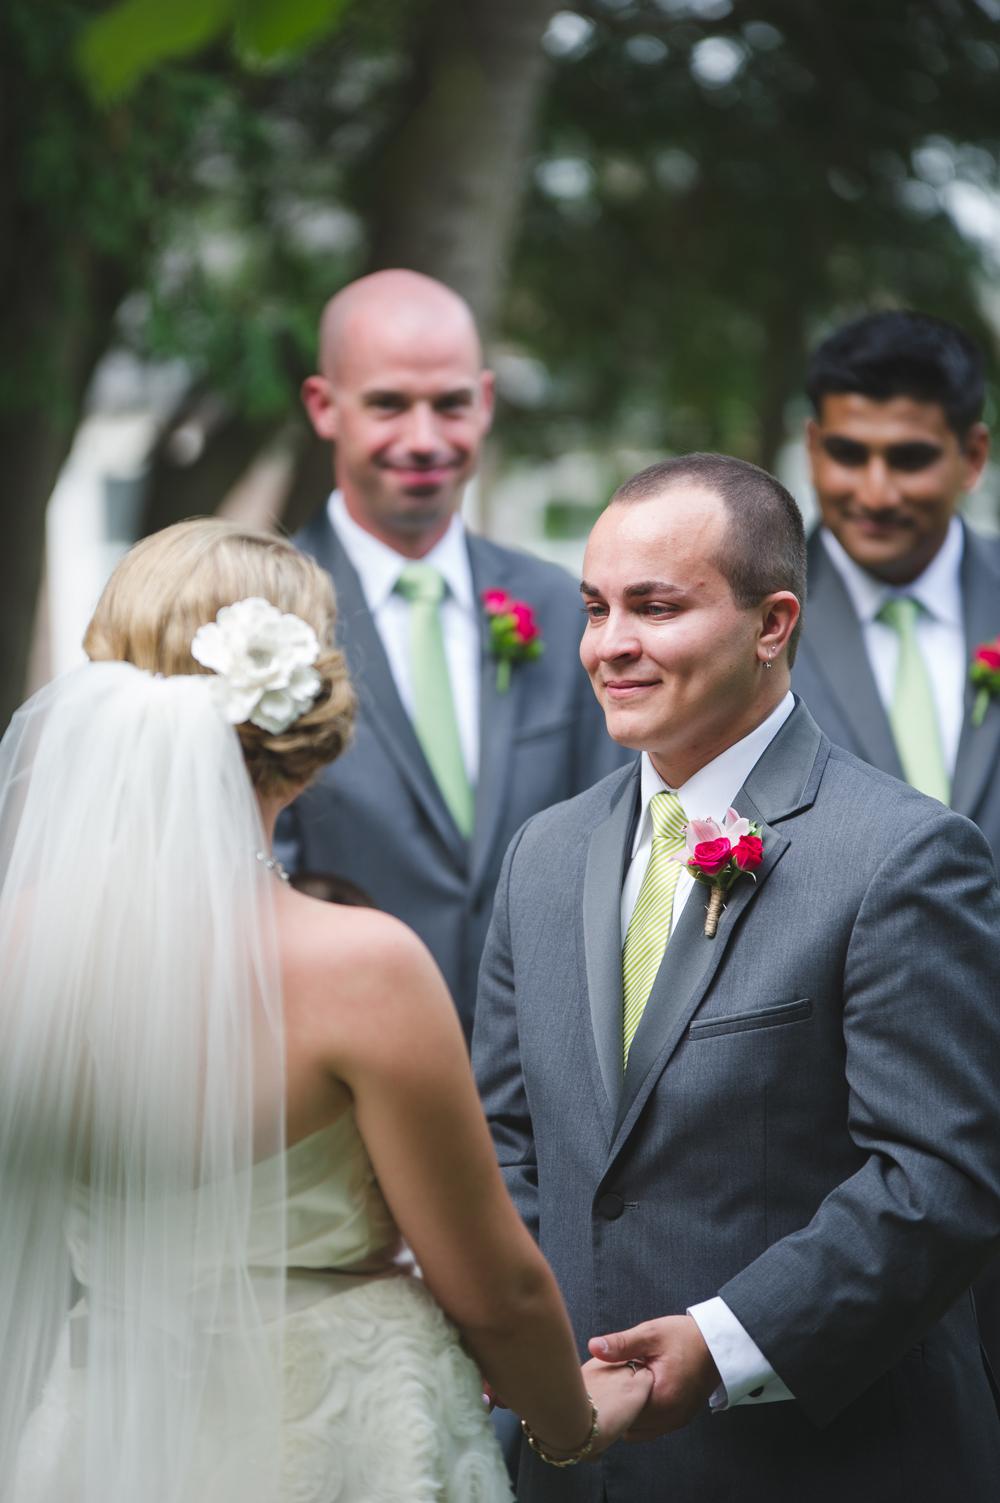 Tarrywile-Mansion-Wedding-Greg-Lewis-Photo-47